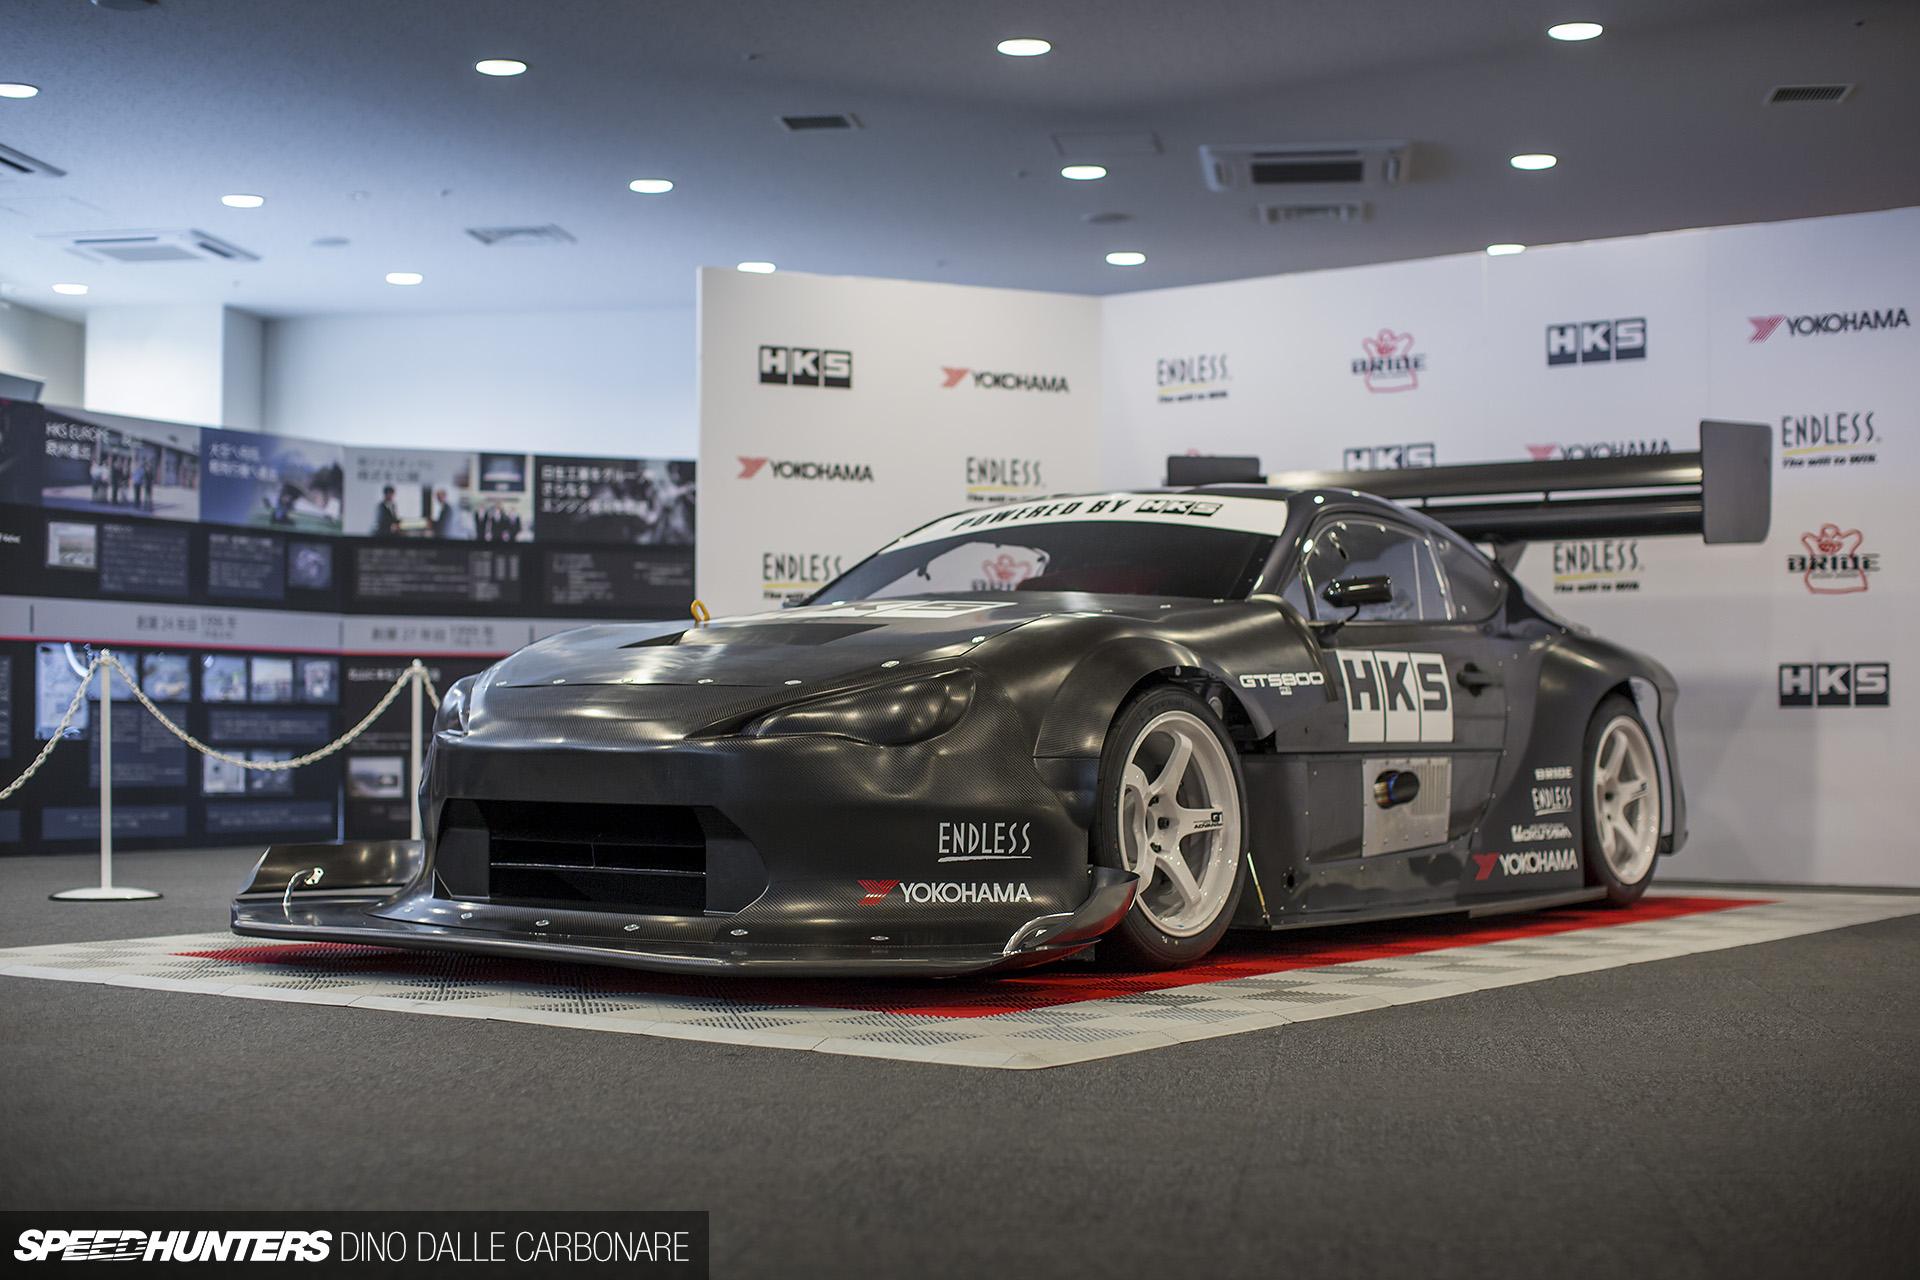 Hks Gts800 The Tsukuba Record Challenger Speedhunters